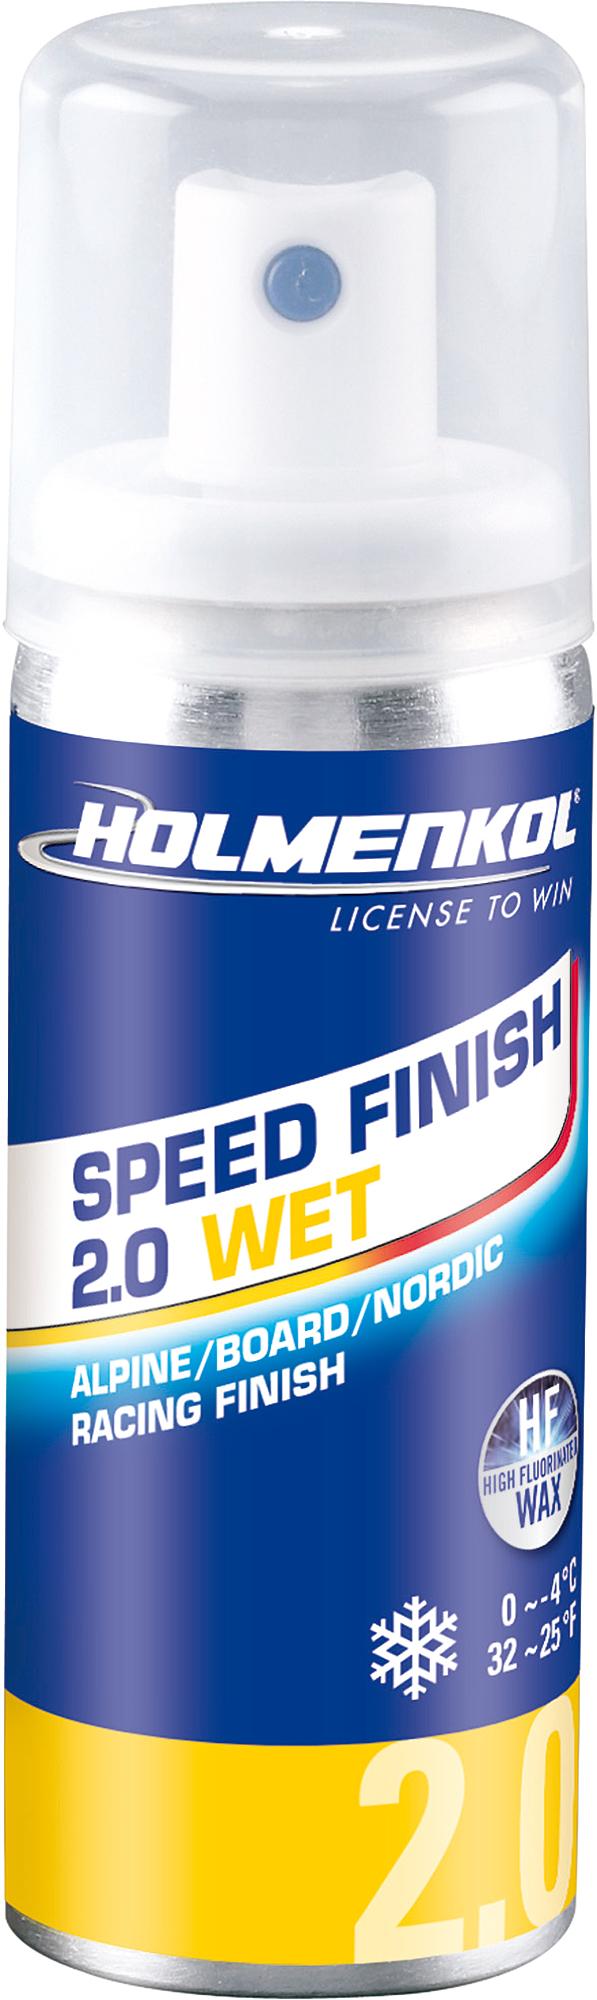 Holmenkol Эмульсия фторуглеродная для лыж и сноубордов HOLMENKOL Speed Finish 2.0WET